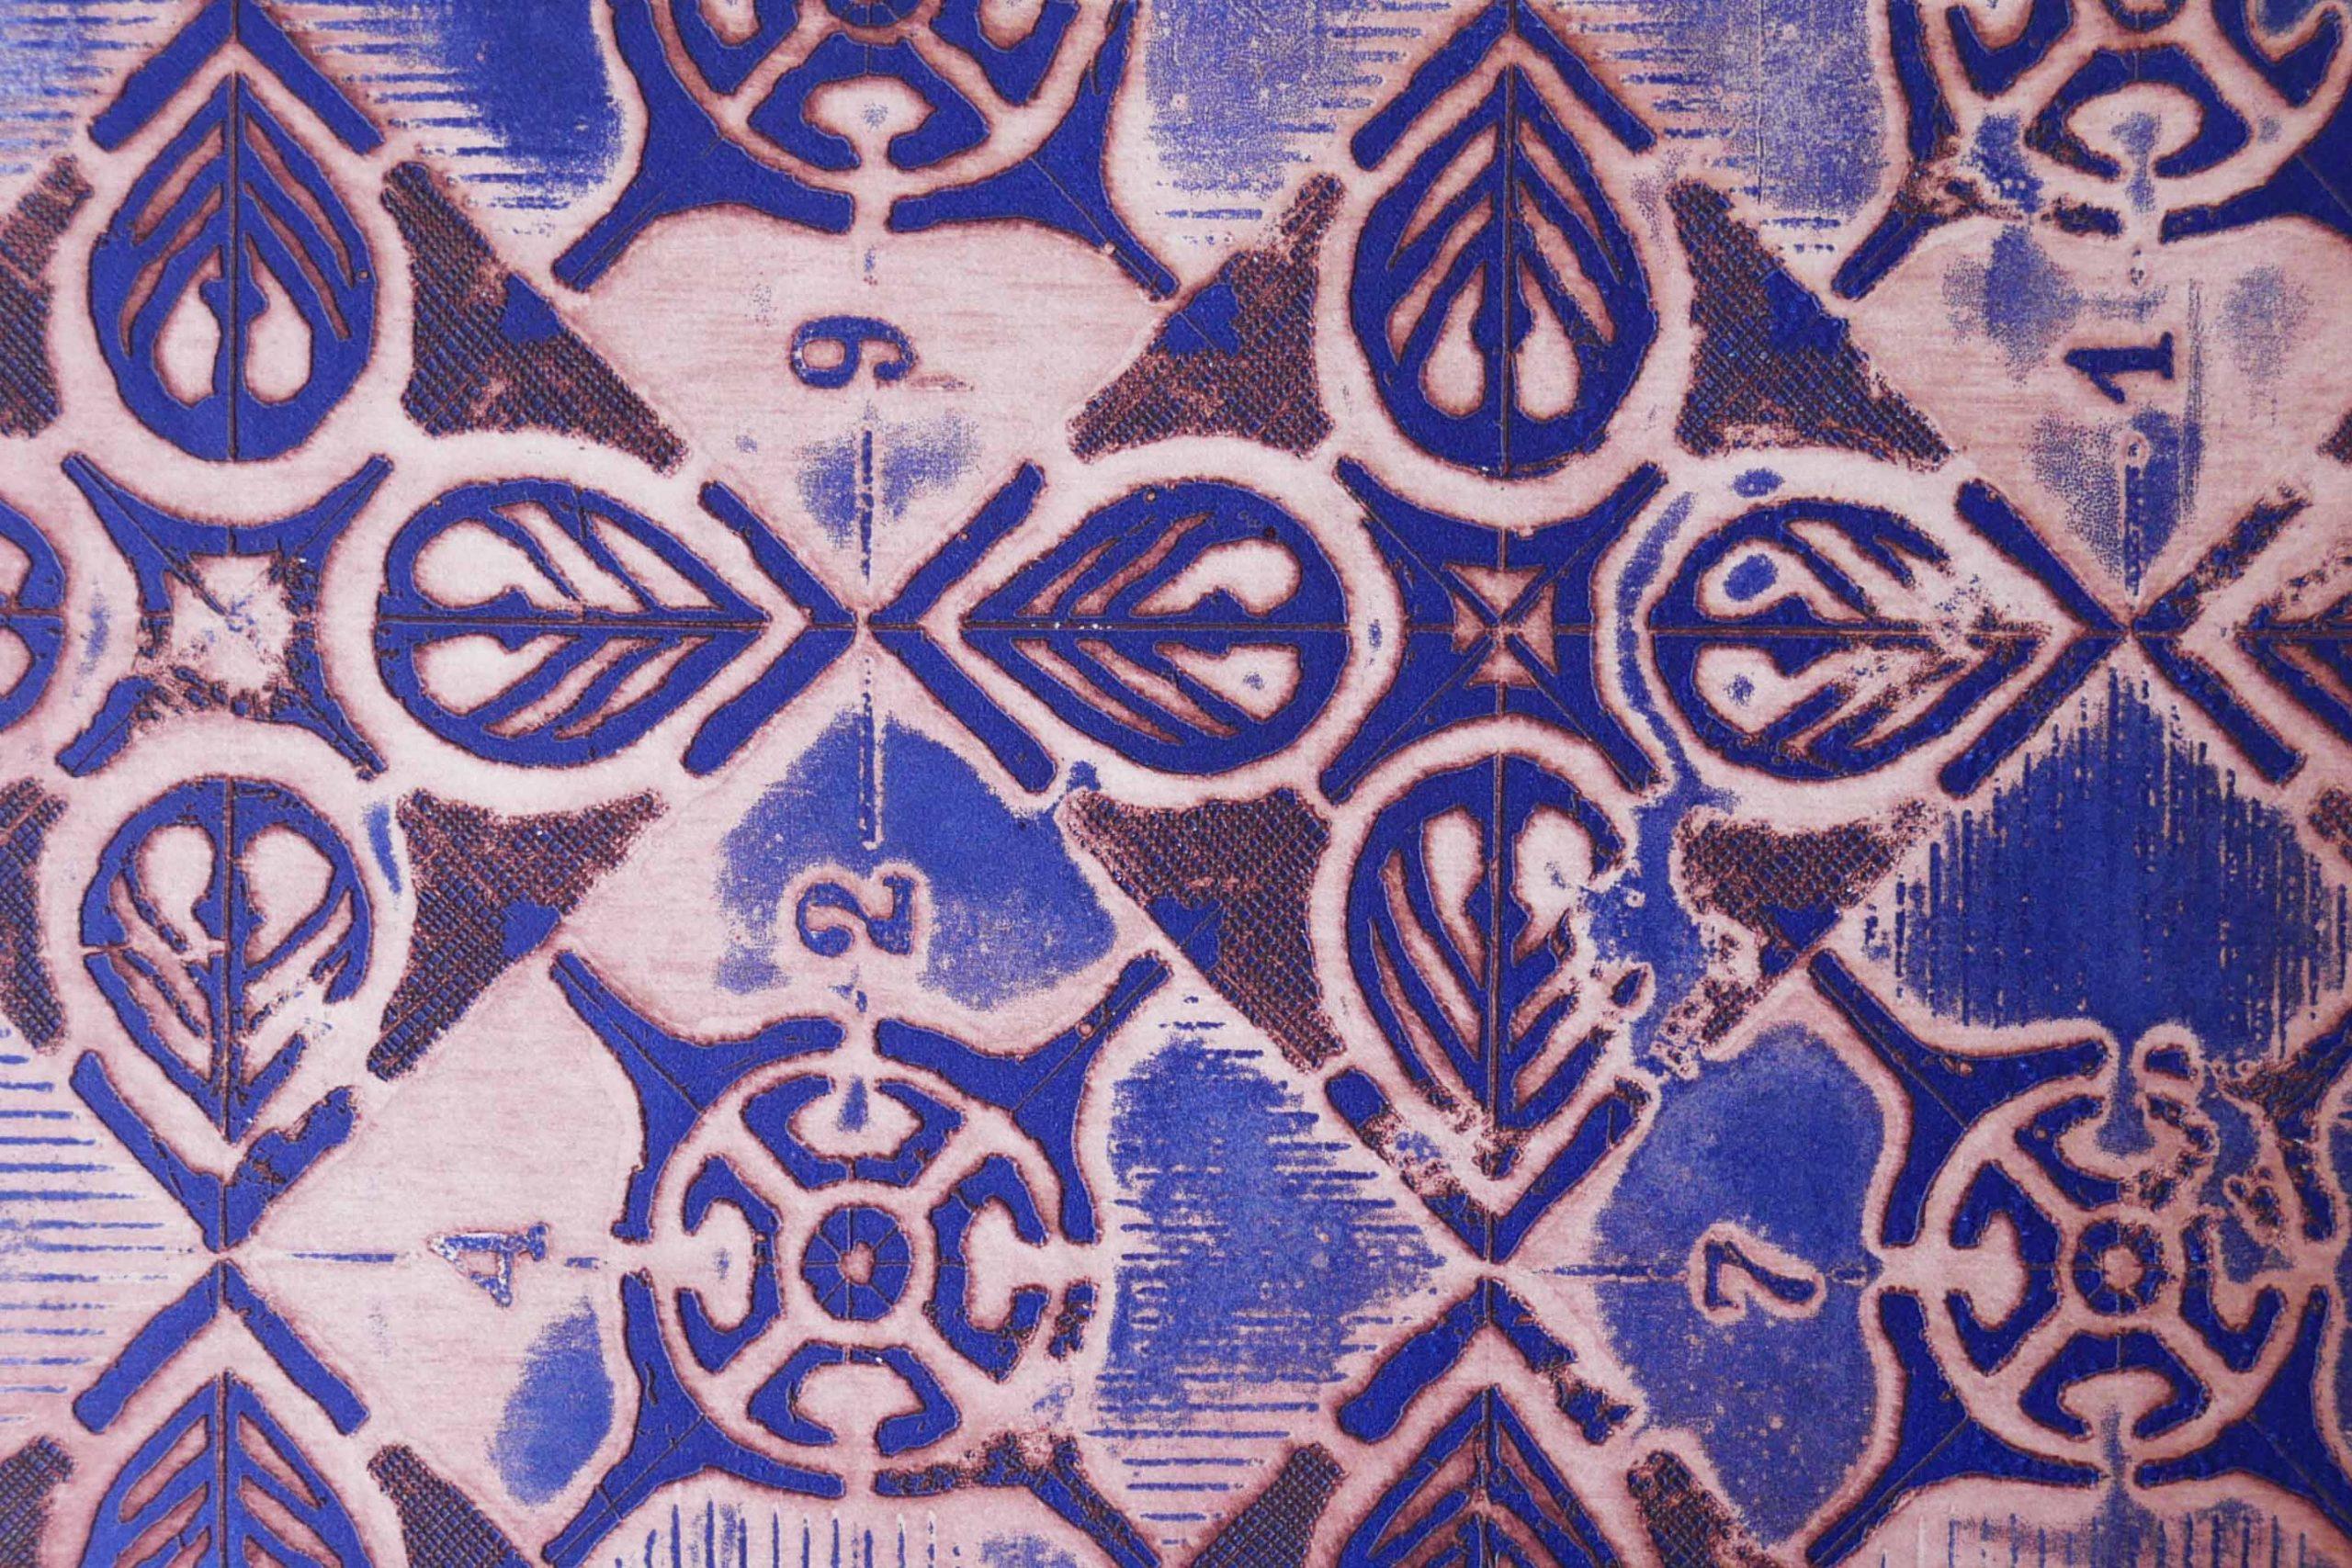 Druckgrafik Prägedruck blau und rote Ränder Ornamentk